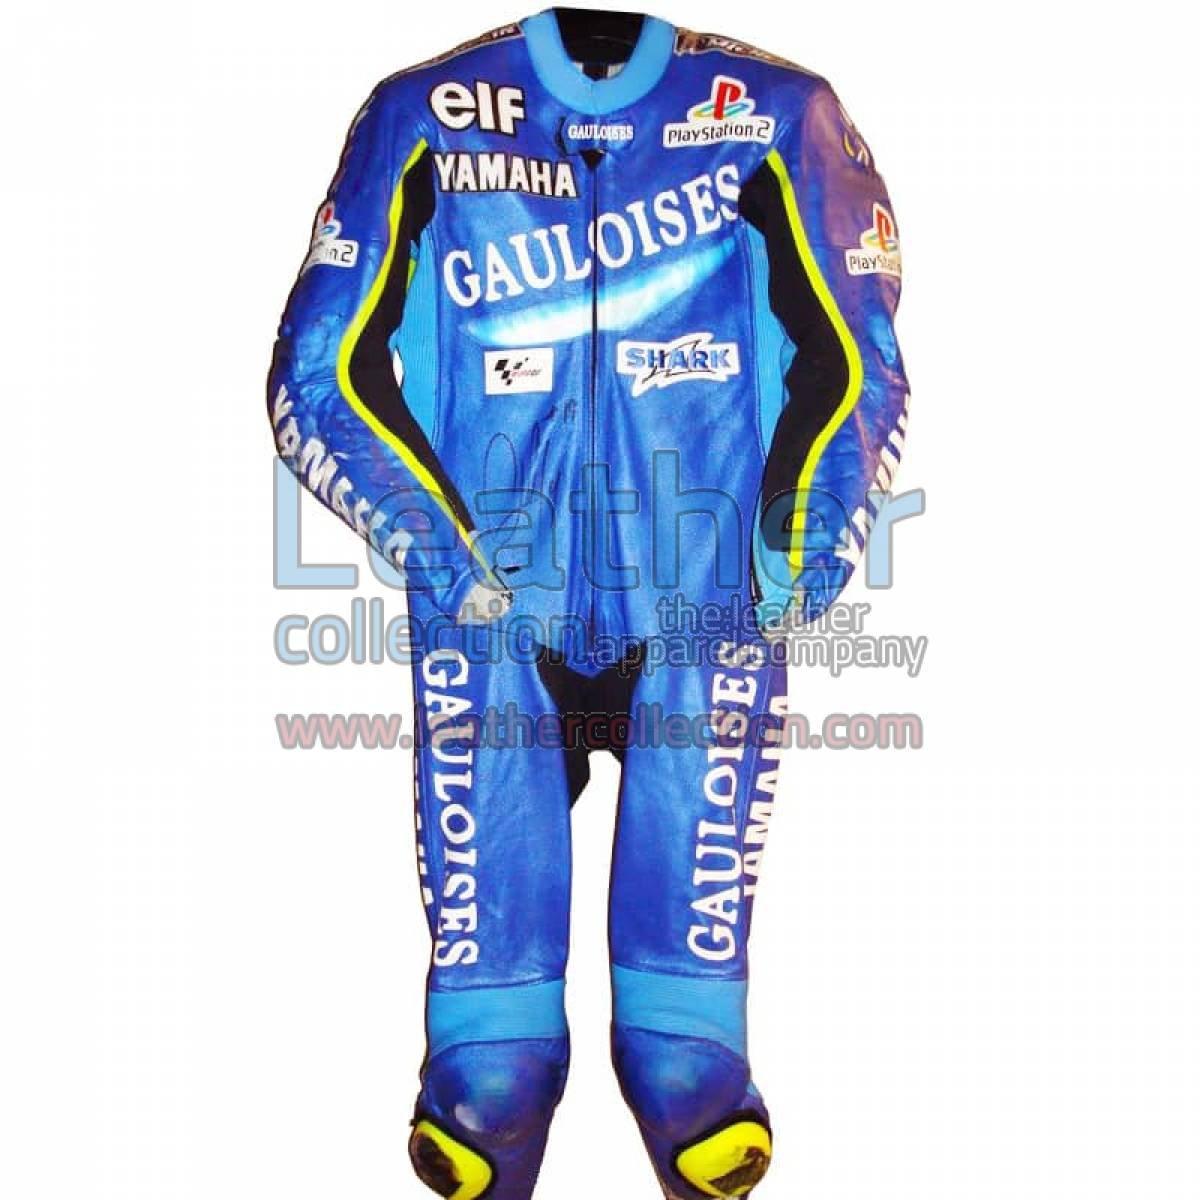 Olivier Jacque Yamaha GP 2002  Racing Leathers